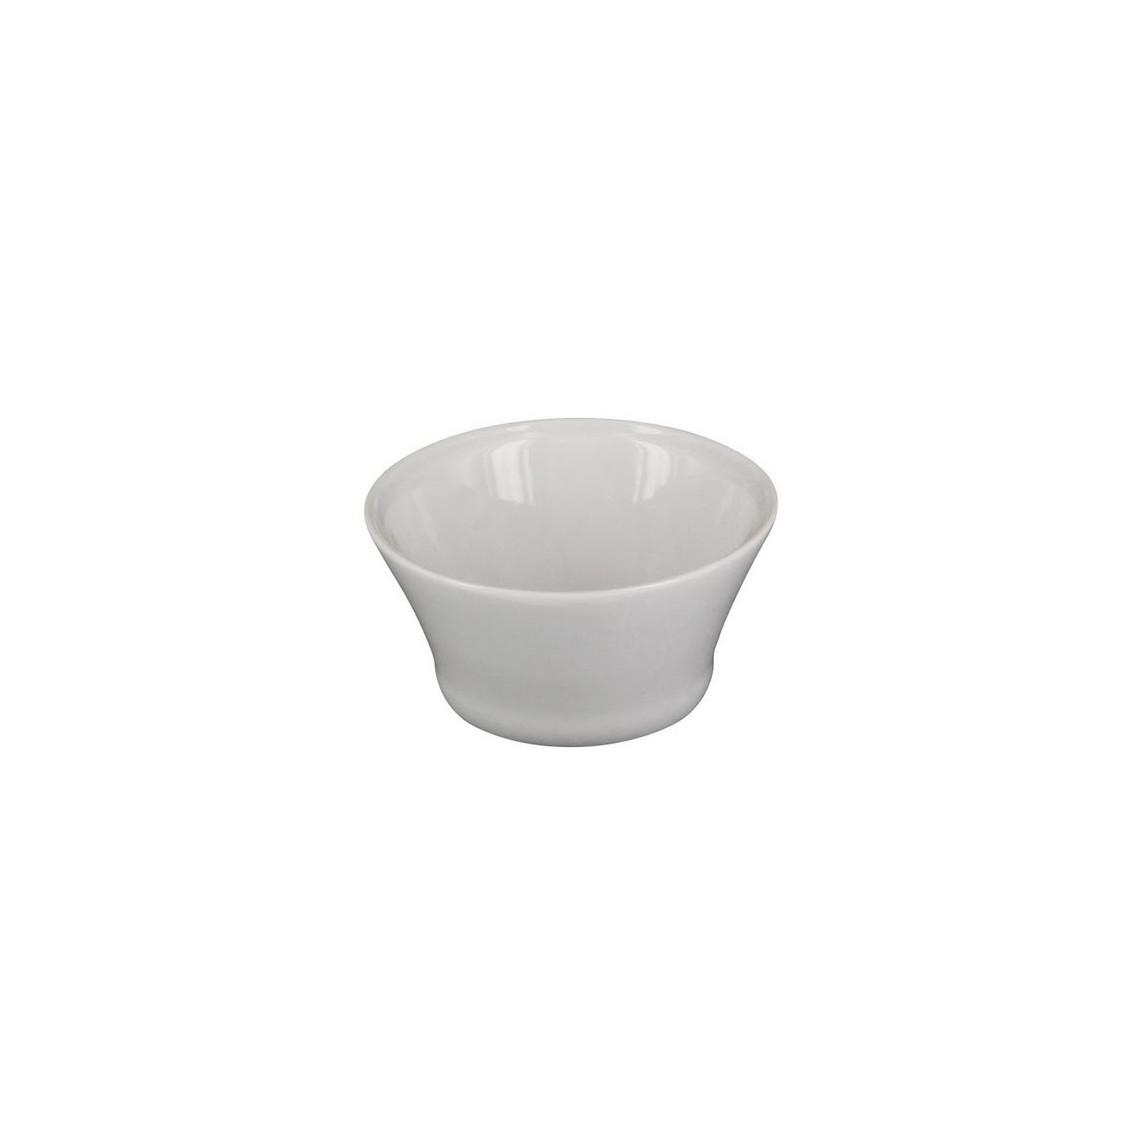 Mini bassine Lilli (8 cl)